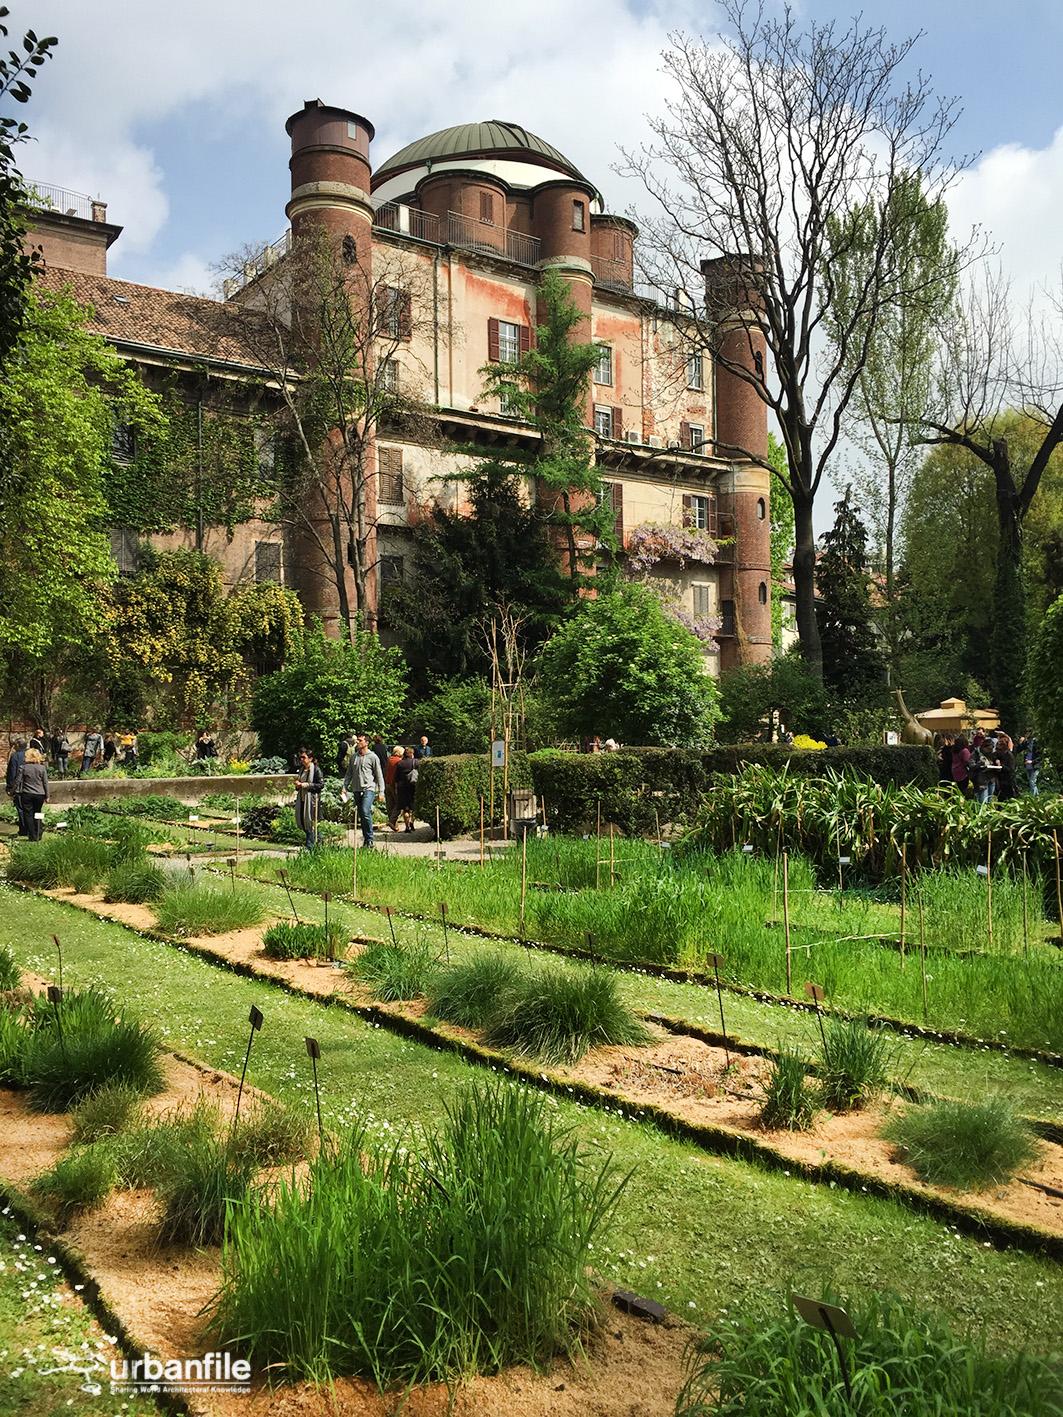 milano brera la meraviglia dell 39 orto botanicoForGiardino Botanico Milano